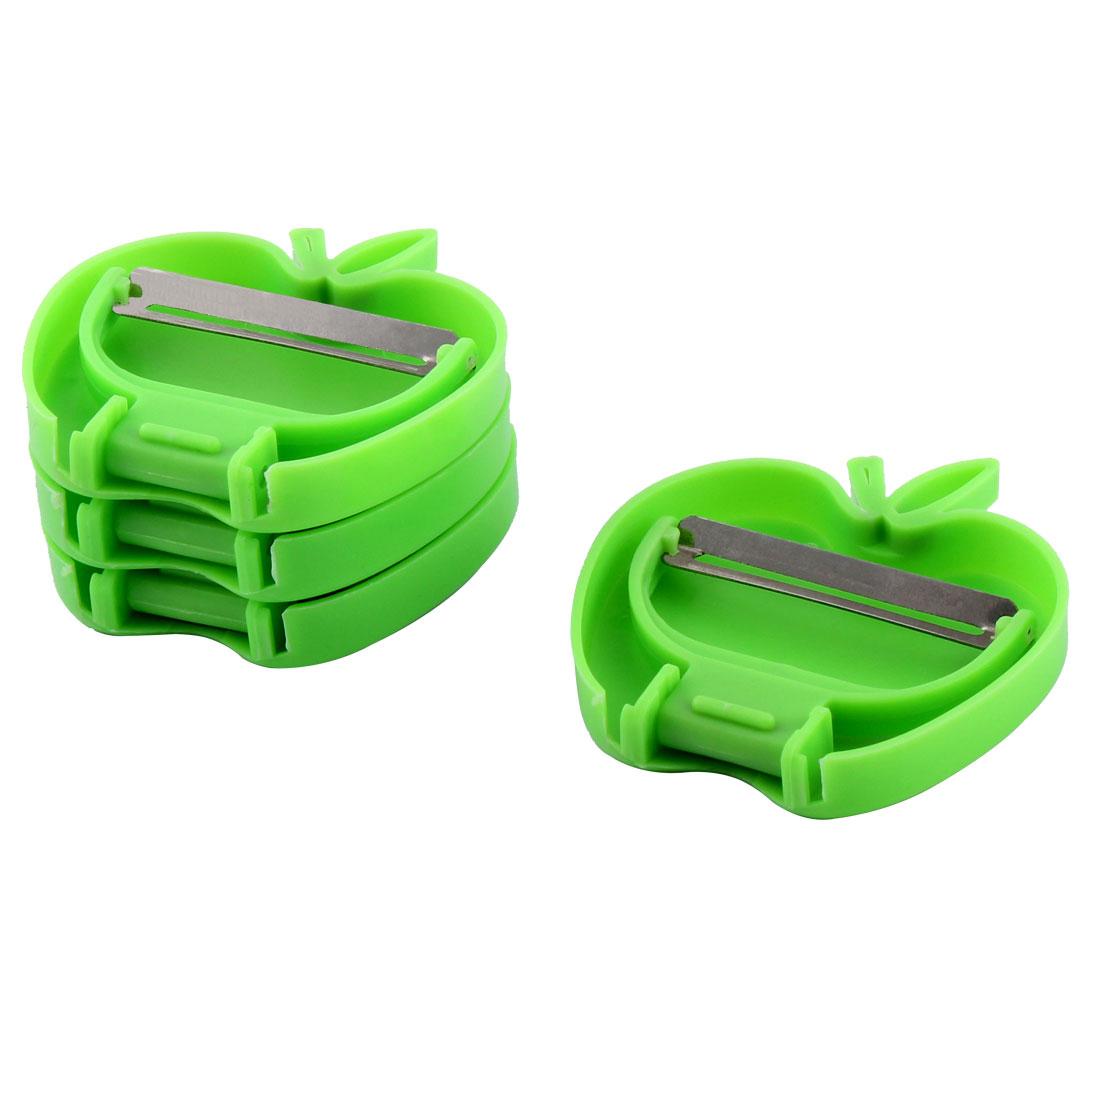 Home Kitchen Plastic Apple Shaped Foldable Fruit Vegetable Peeler Green 4pcs